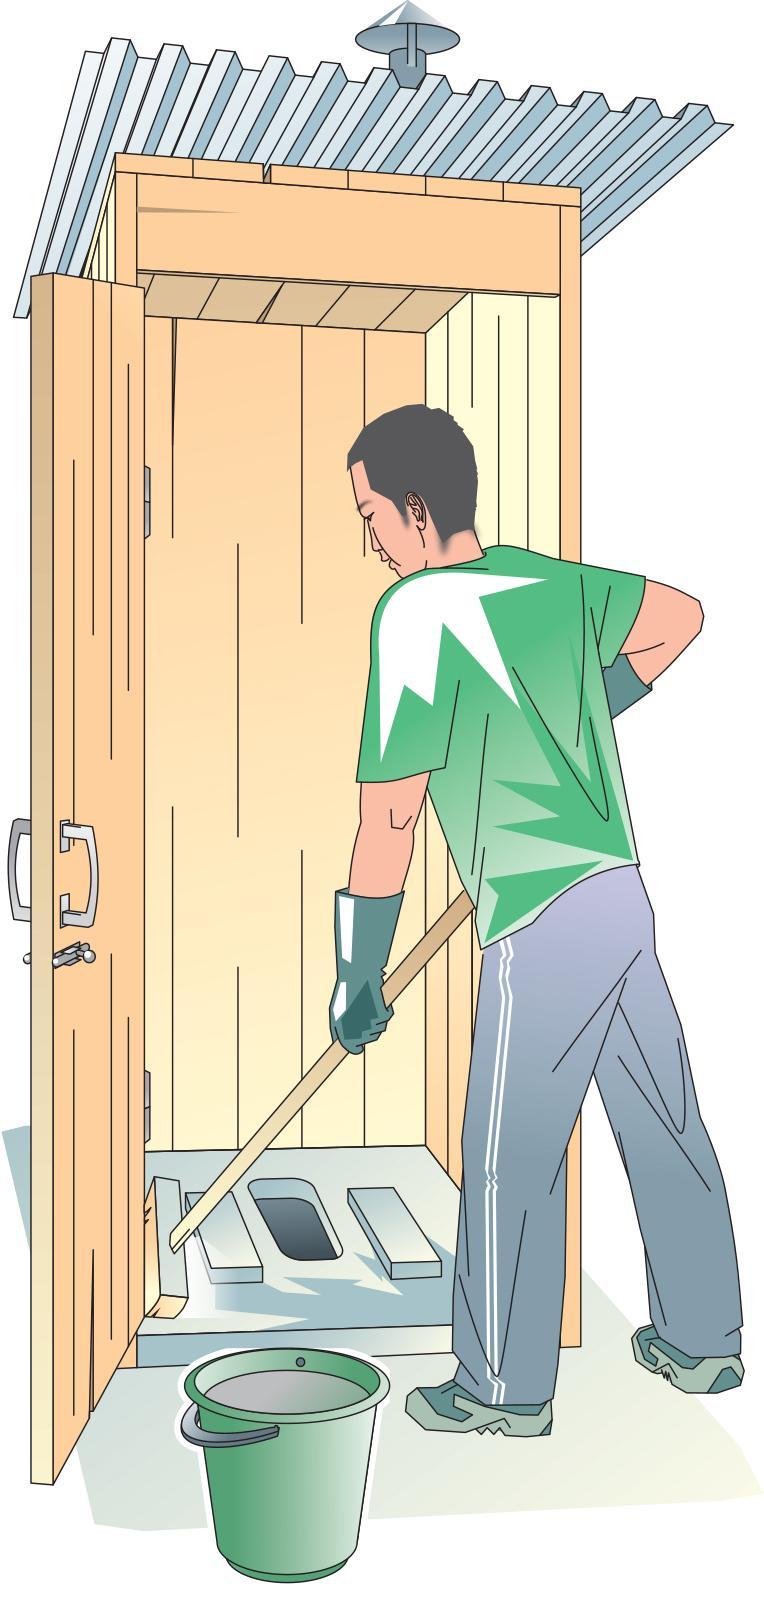 Sanitation - Cleaning the latrine  - 00C - Kyrgyz Republic